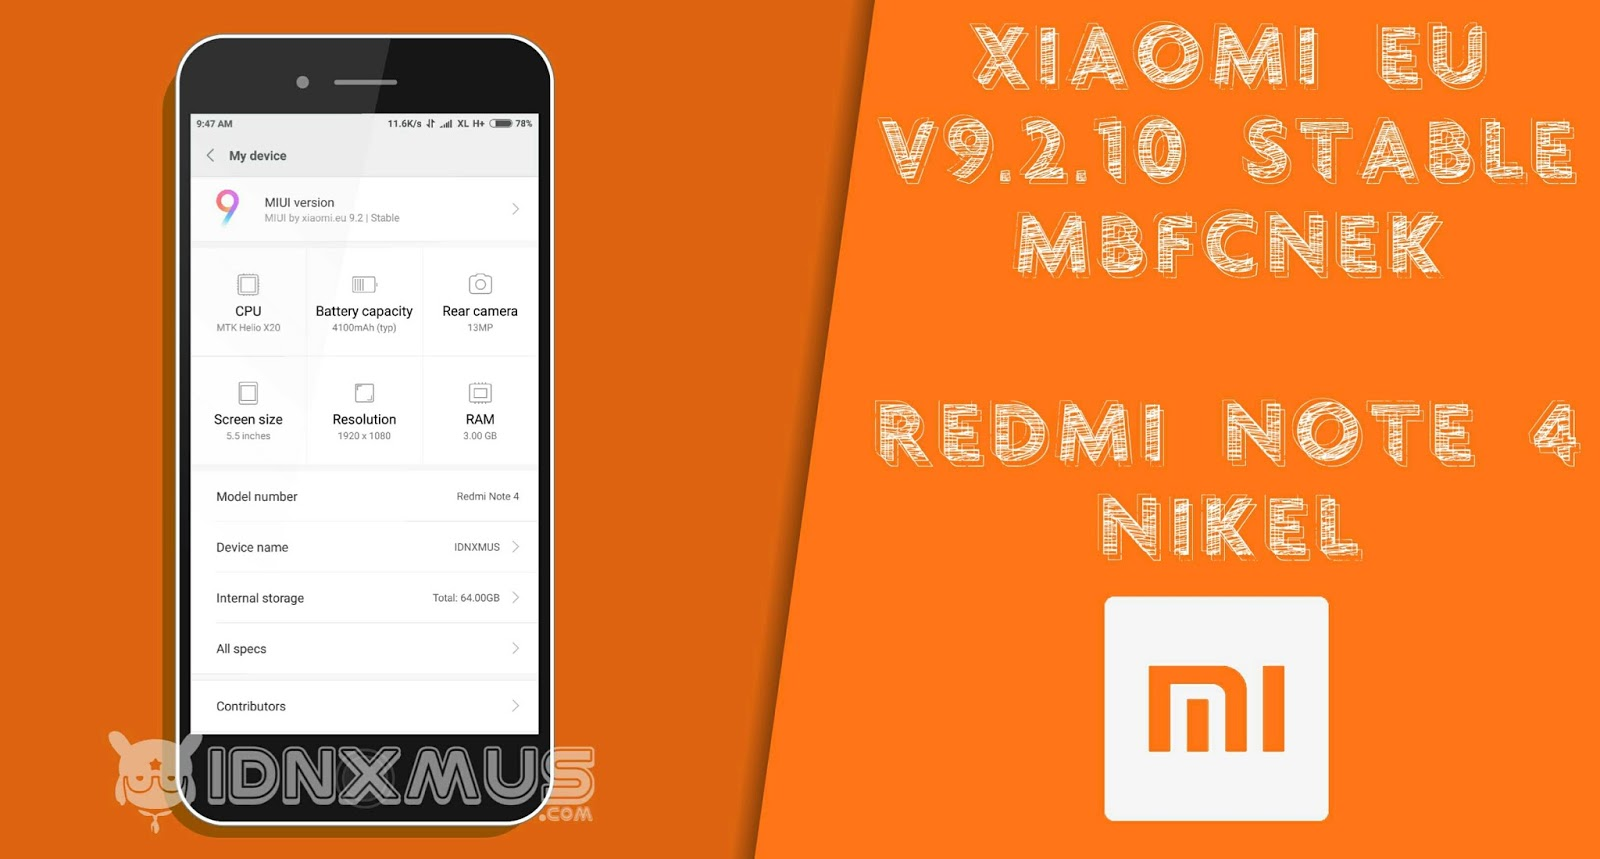 ROM Xiaomi EU Stabil V9.2.1.0 Nikel